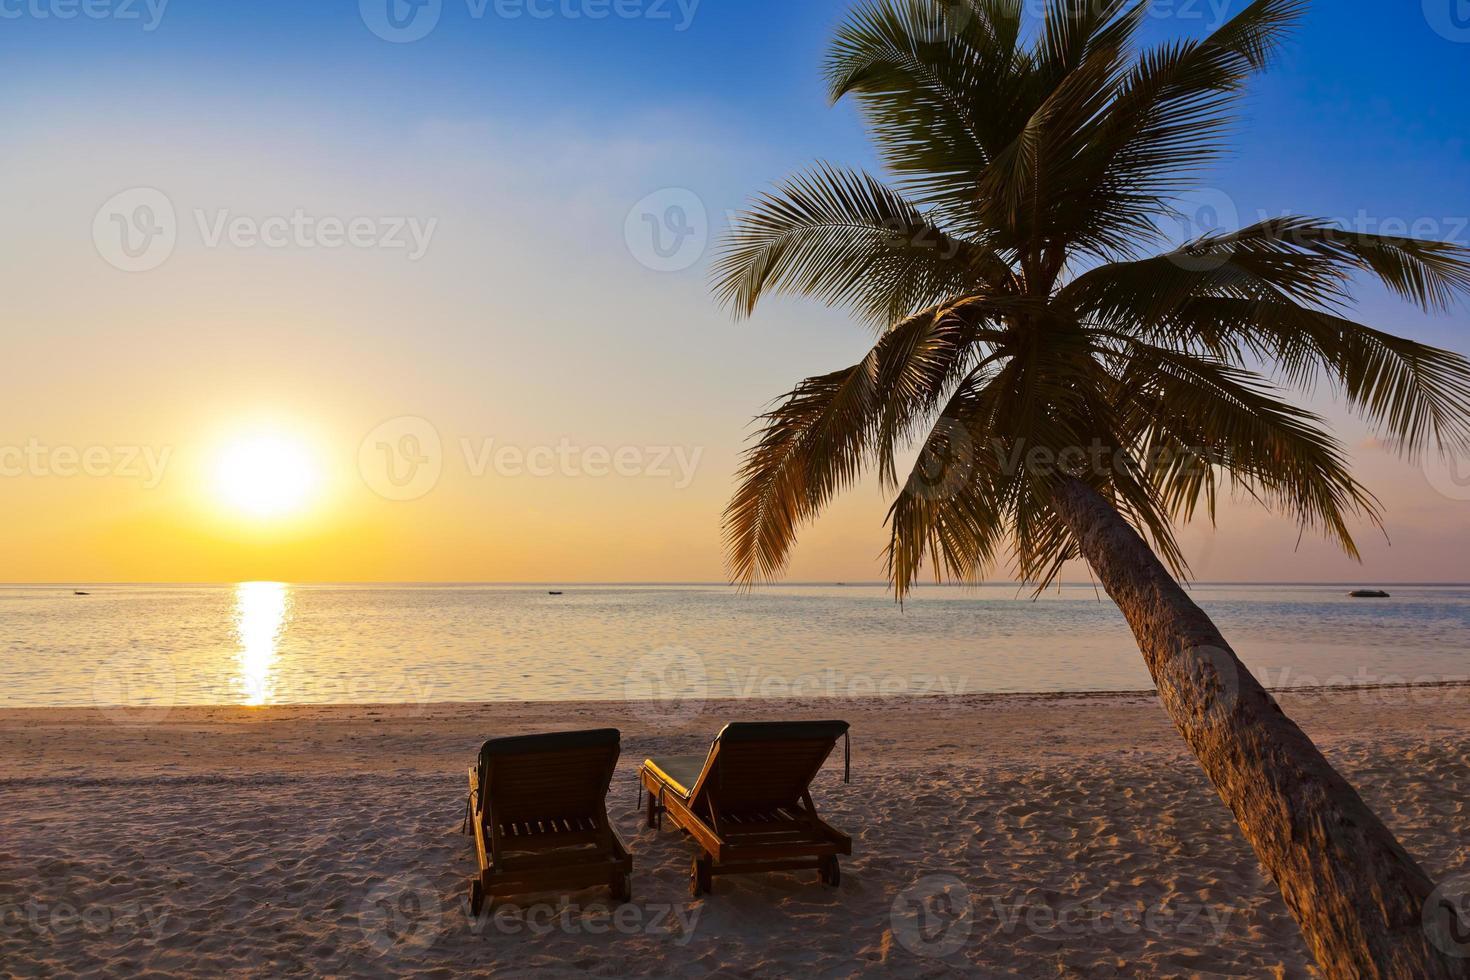 Stühle am Strand der Malediven foto